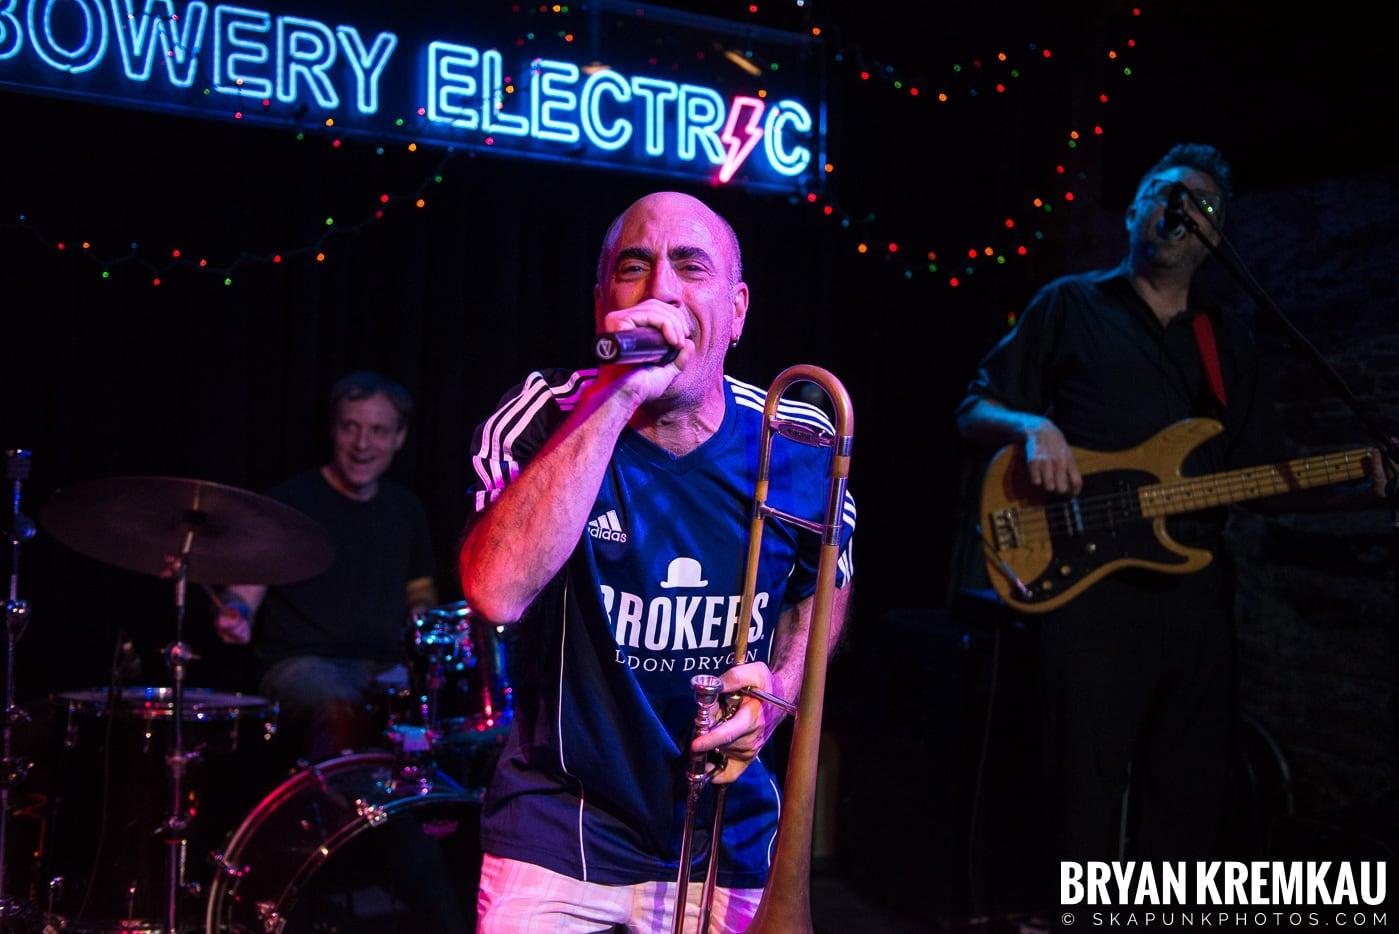 Cenzo @ Bowery Electric, NYC - 11.17.18 (27)